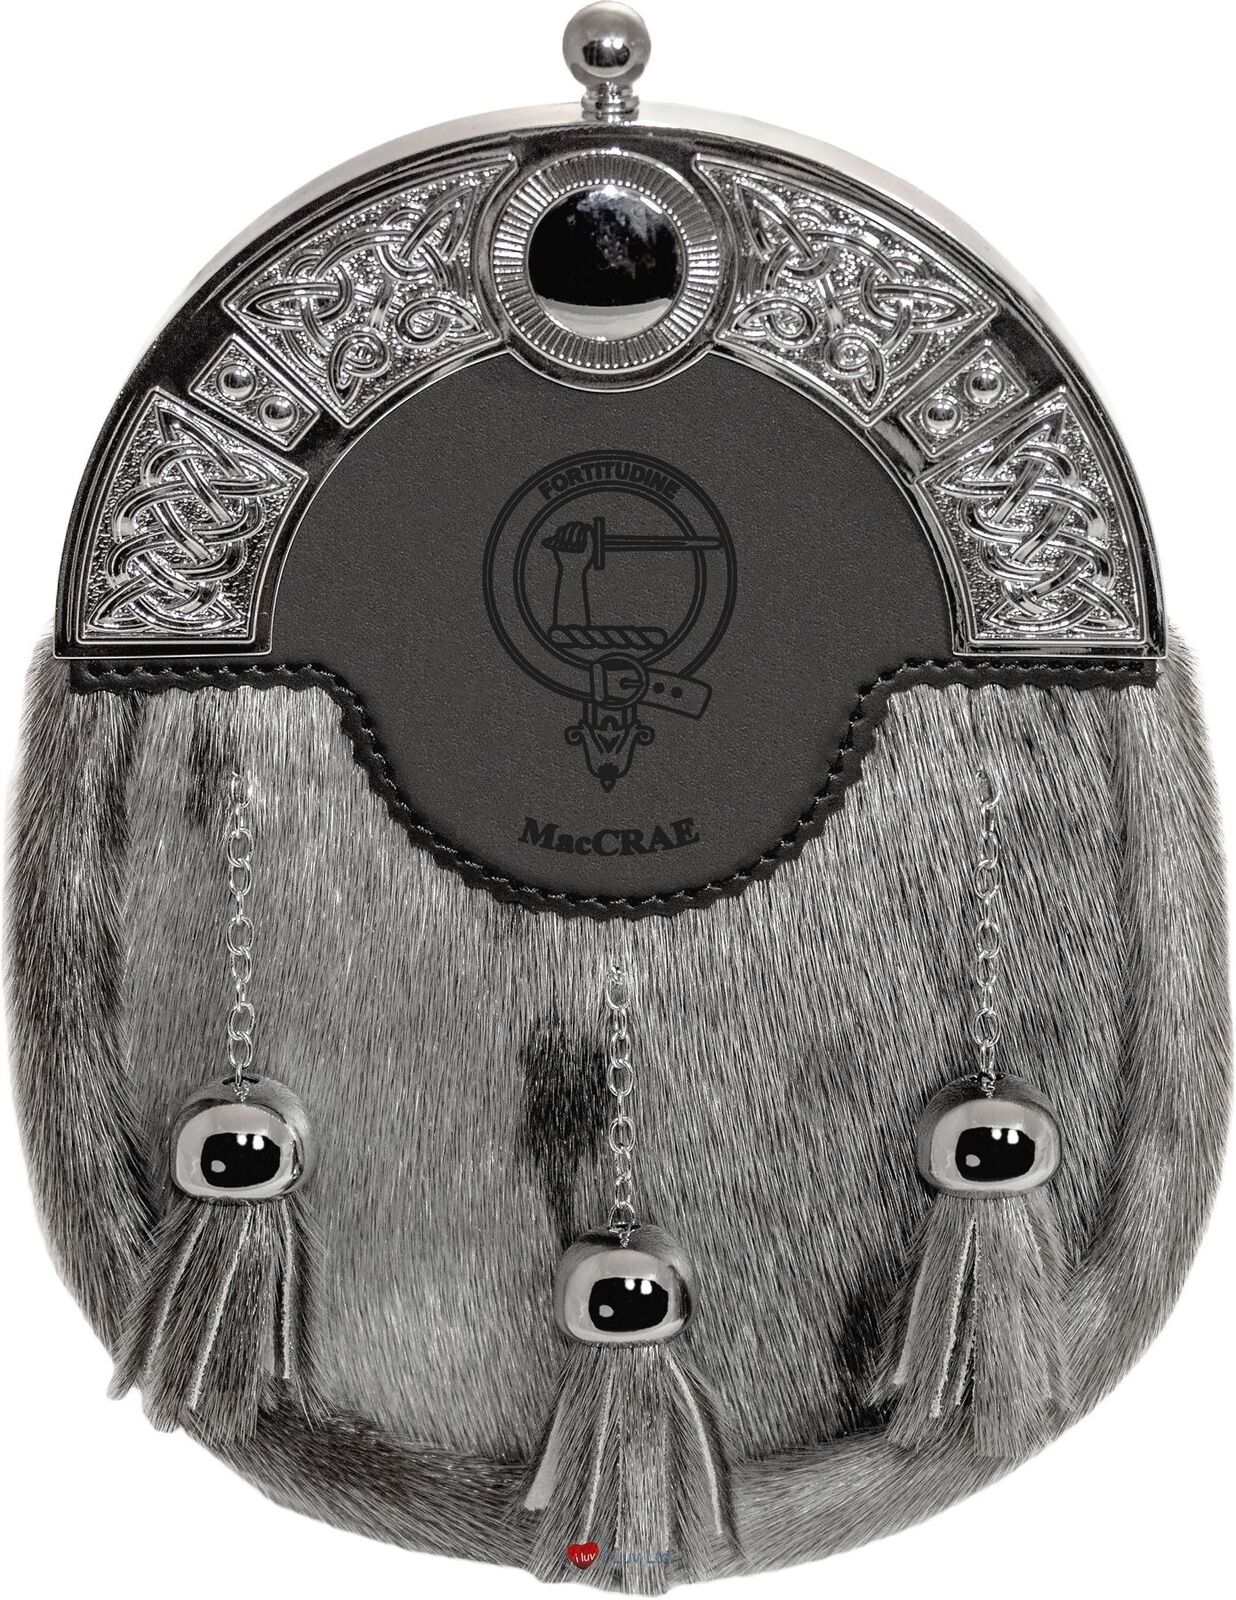 MacCrae Dress Sporran 3 Tassels Studded Celtic Arch Scottish Clan Crest